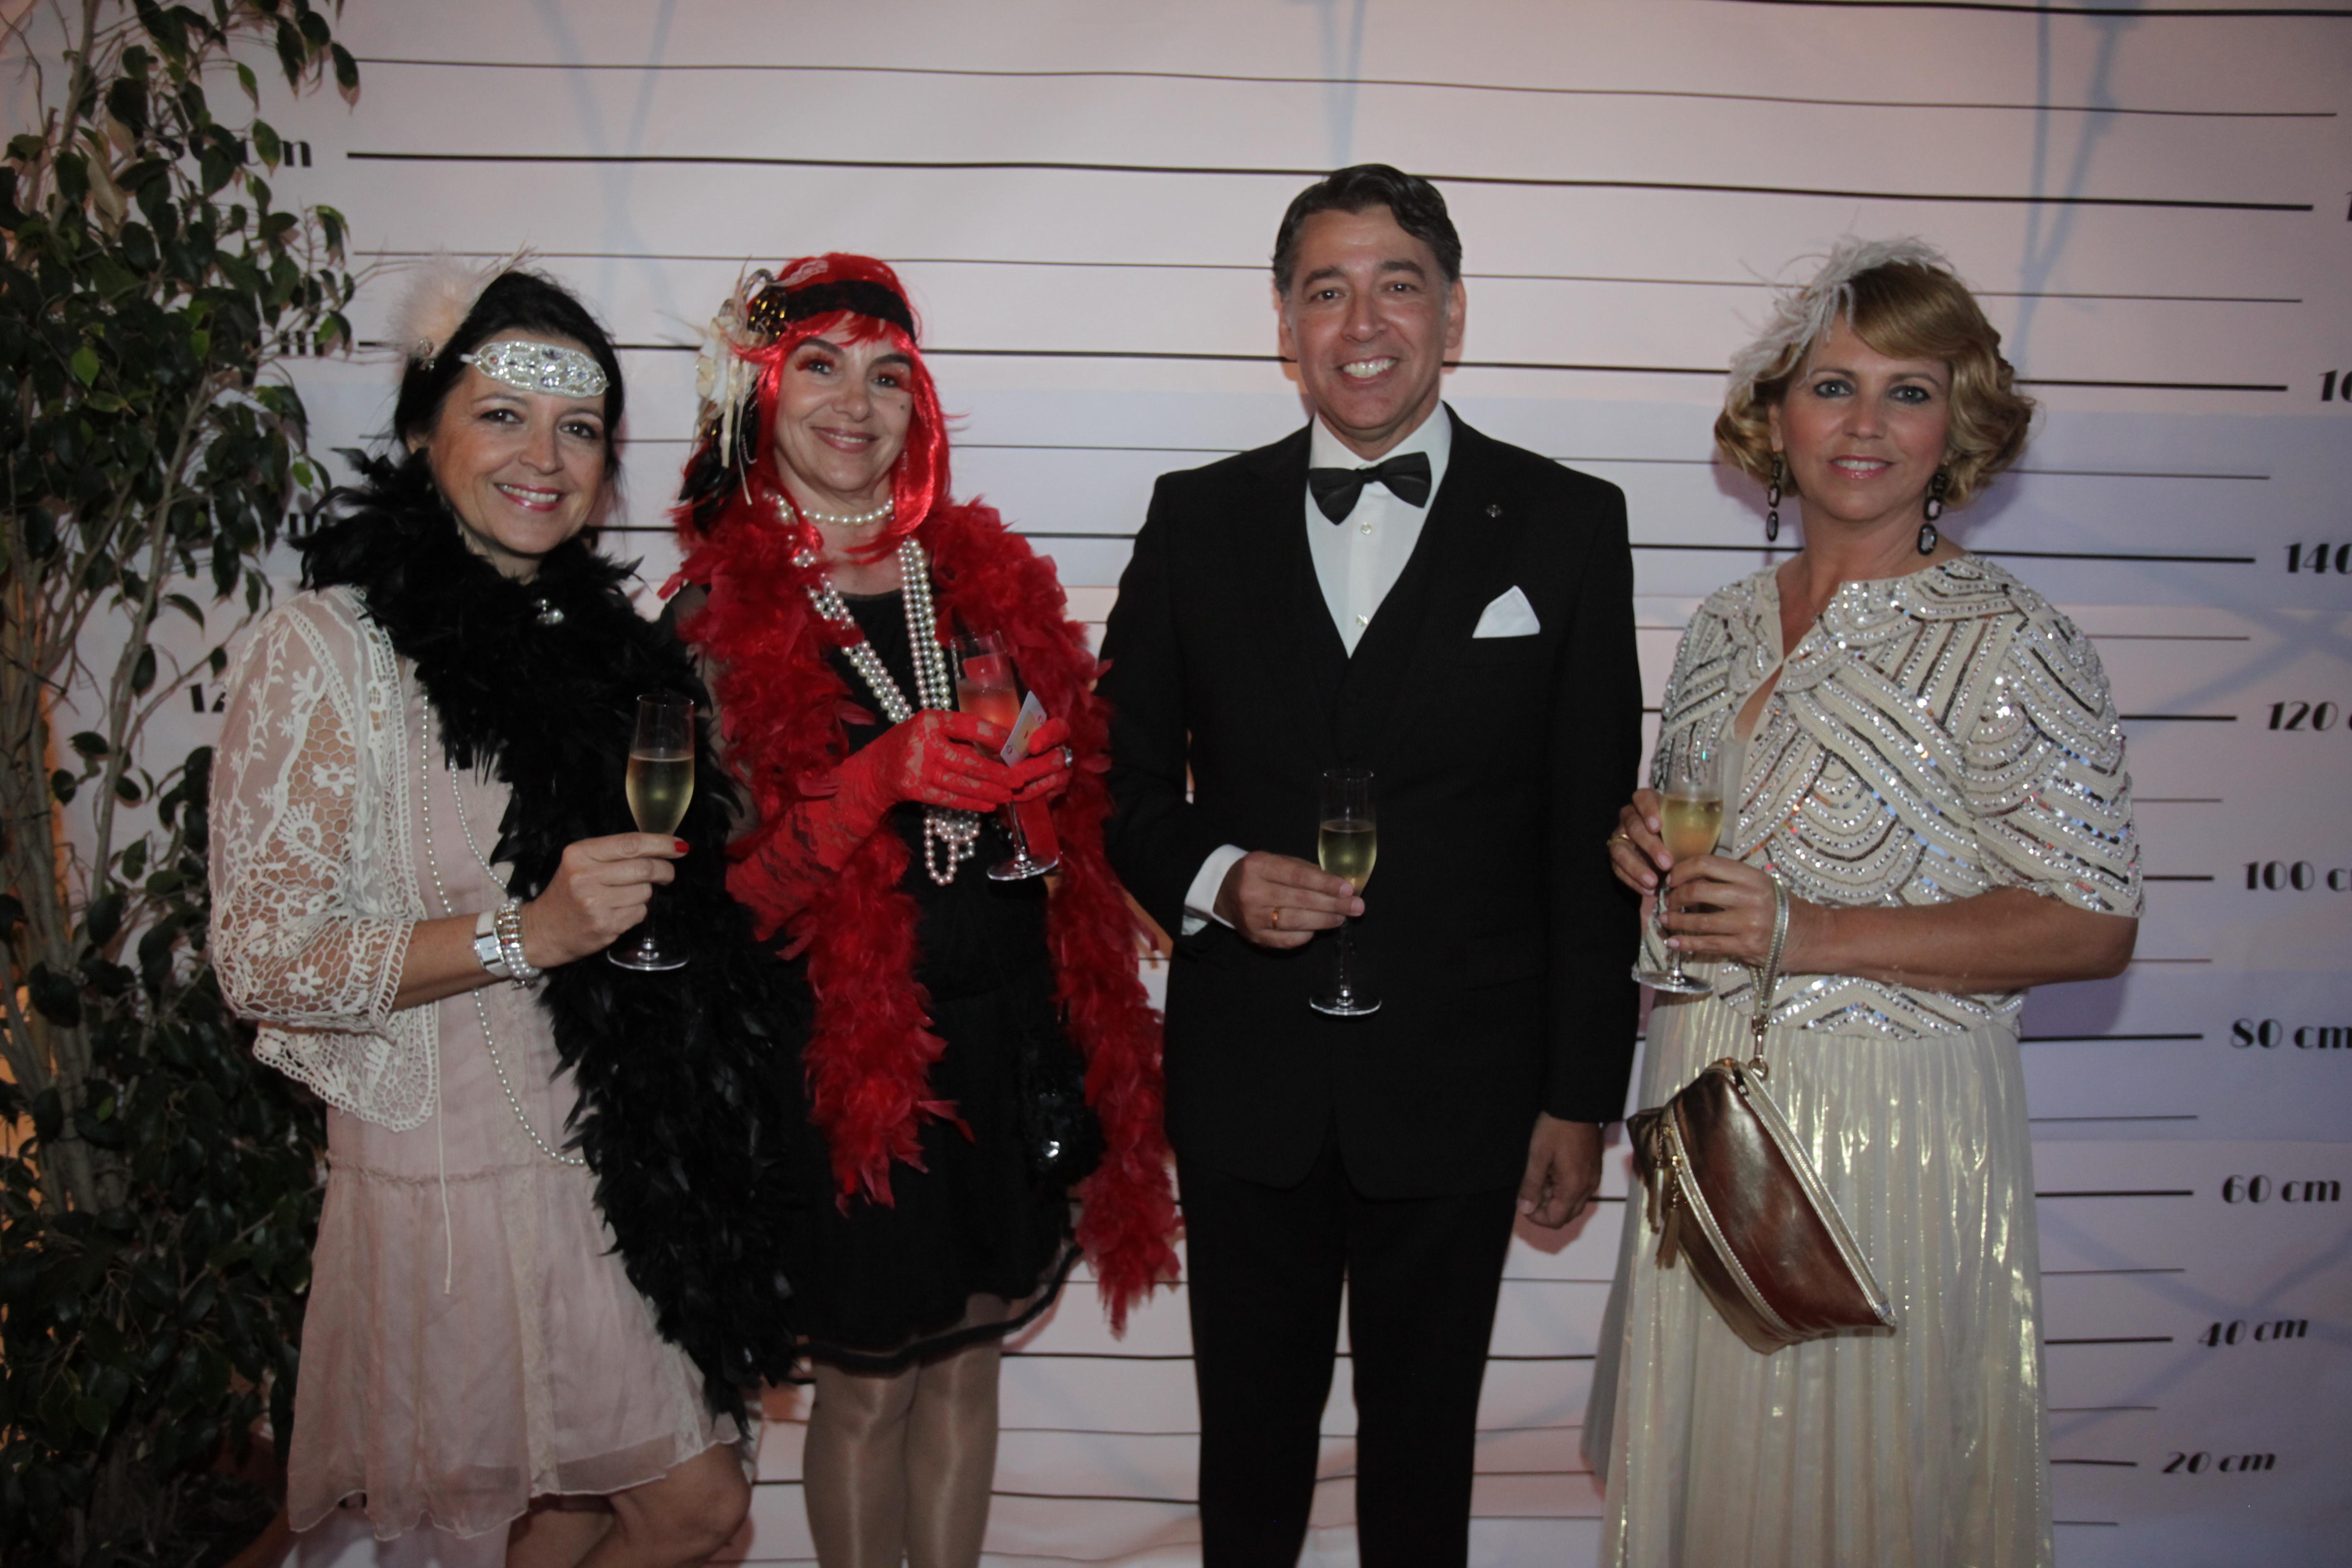 Se presenta el rotary club m laga alcazaba con una fiesta a os 20 yo soy mujer - Fiesta anos 20 ...